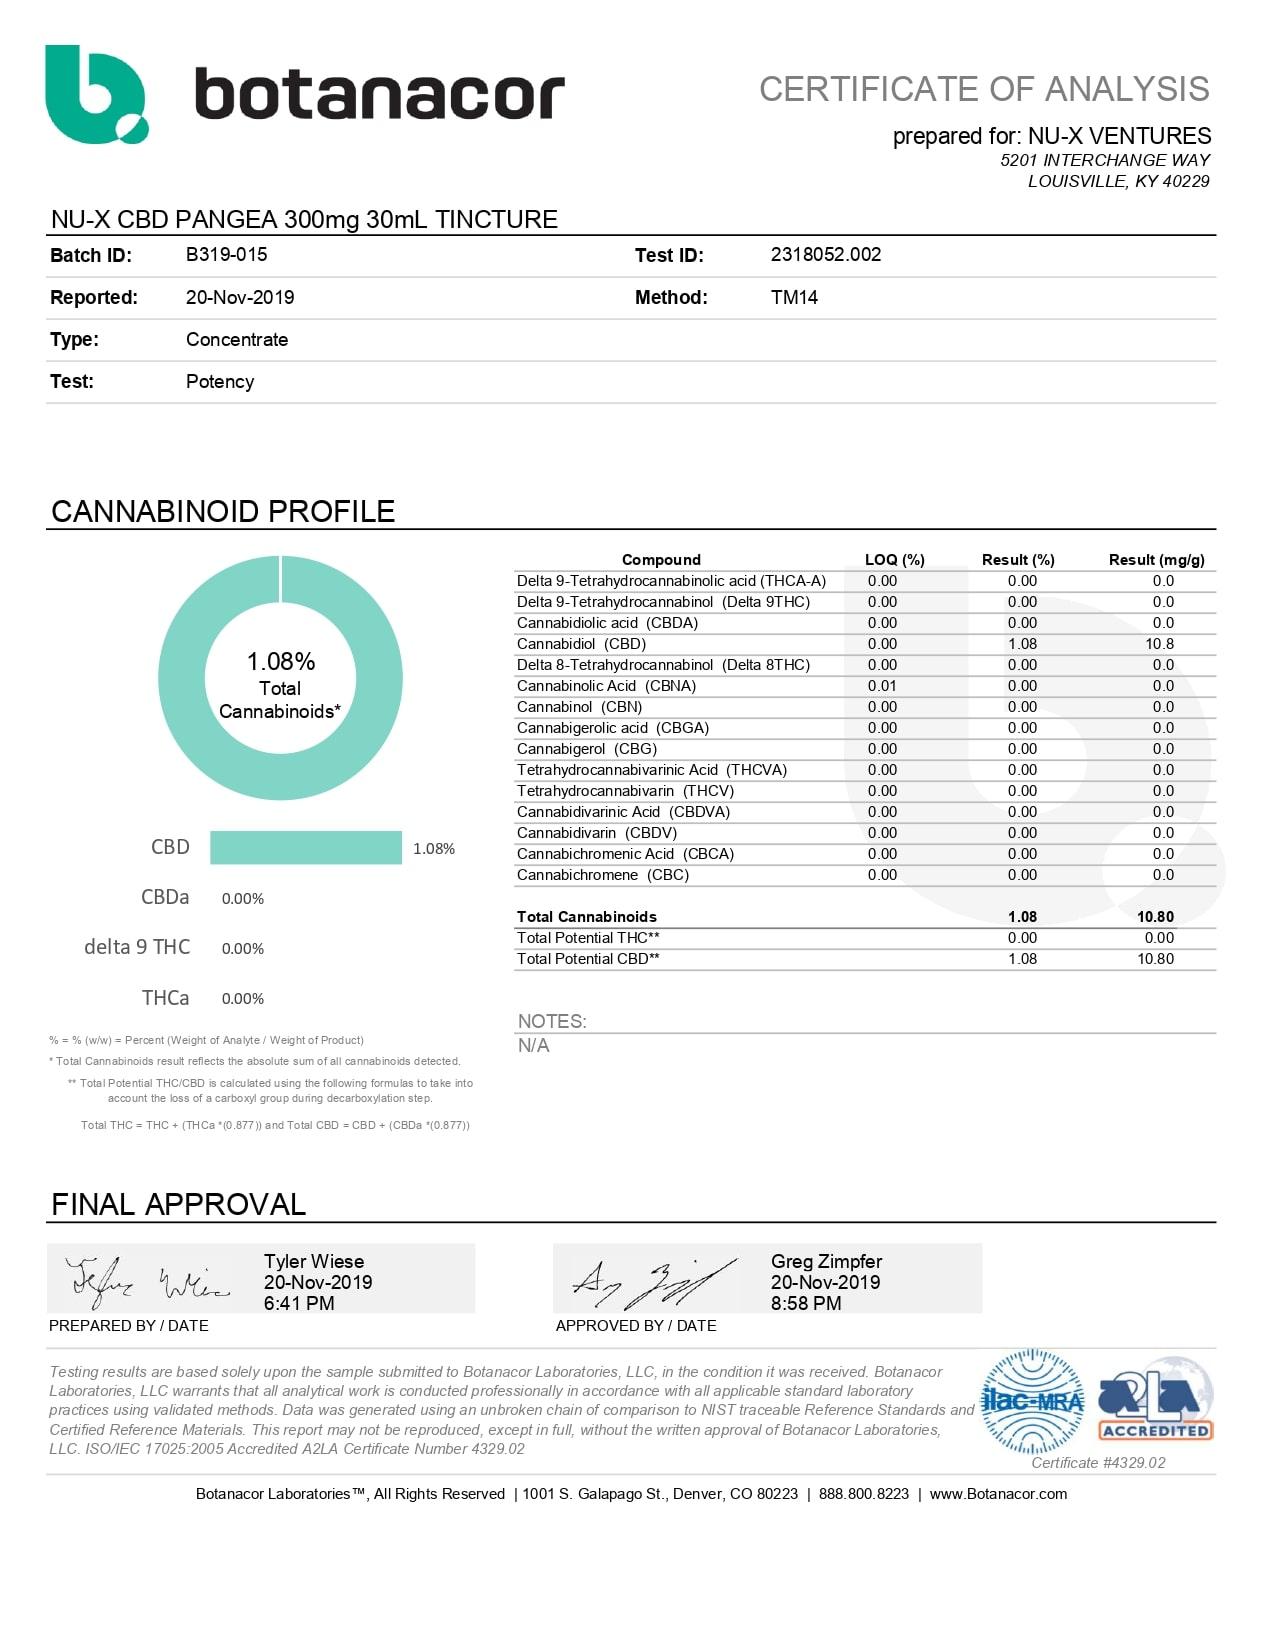 NU-X CBD Tincture Lab Report | Pangea Kush Flavored 300mg